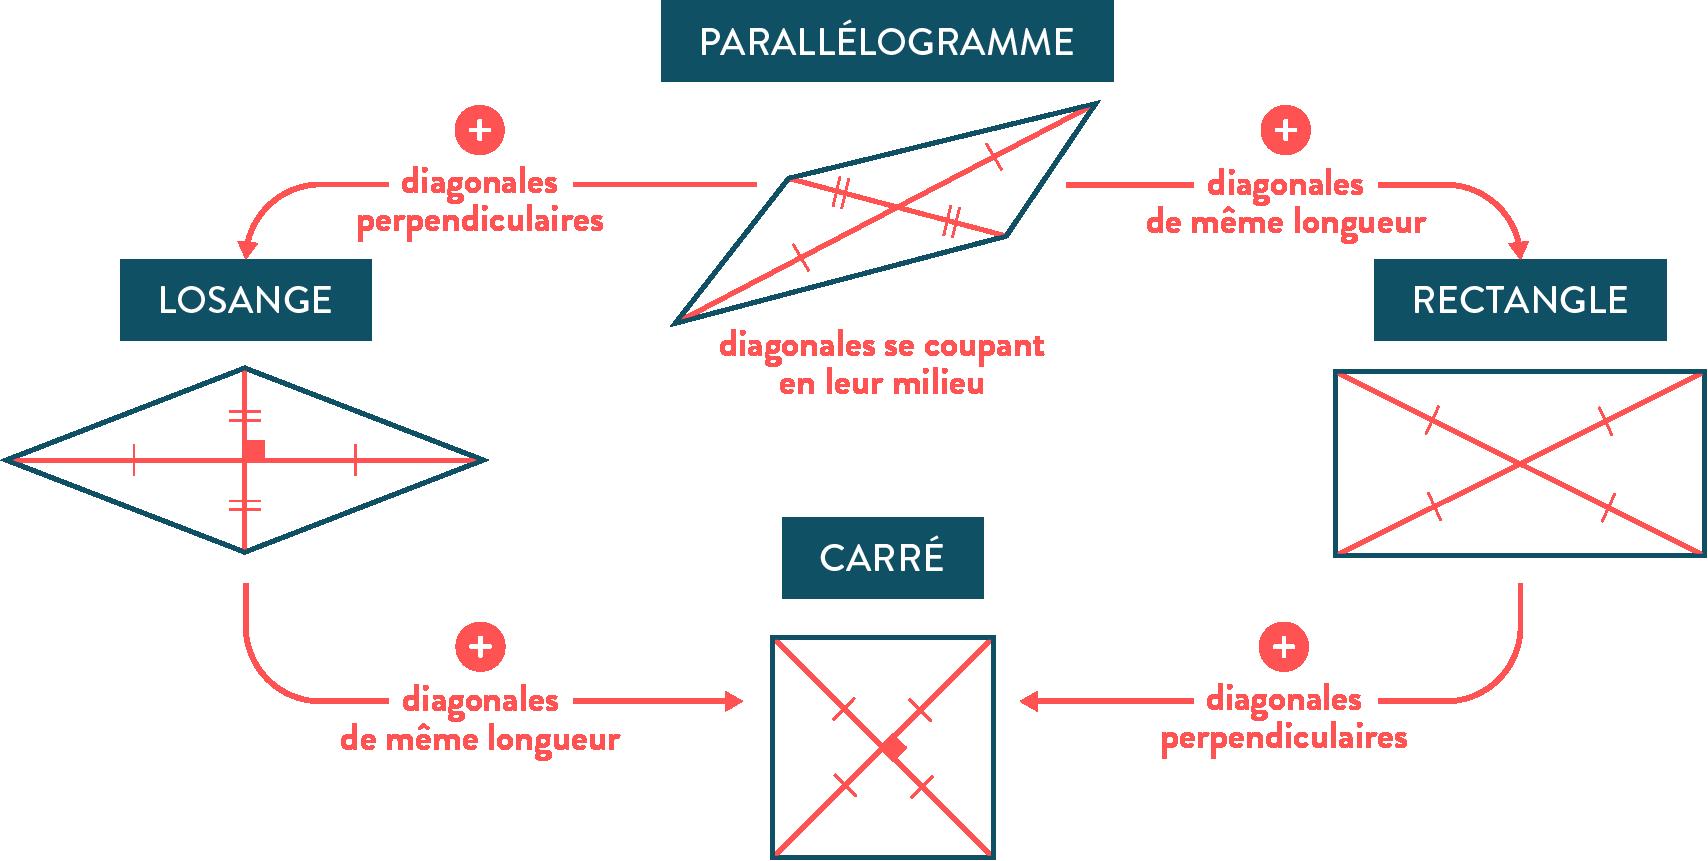 Bilan parallélogramme, losange, rectangle, carré